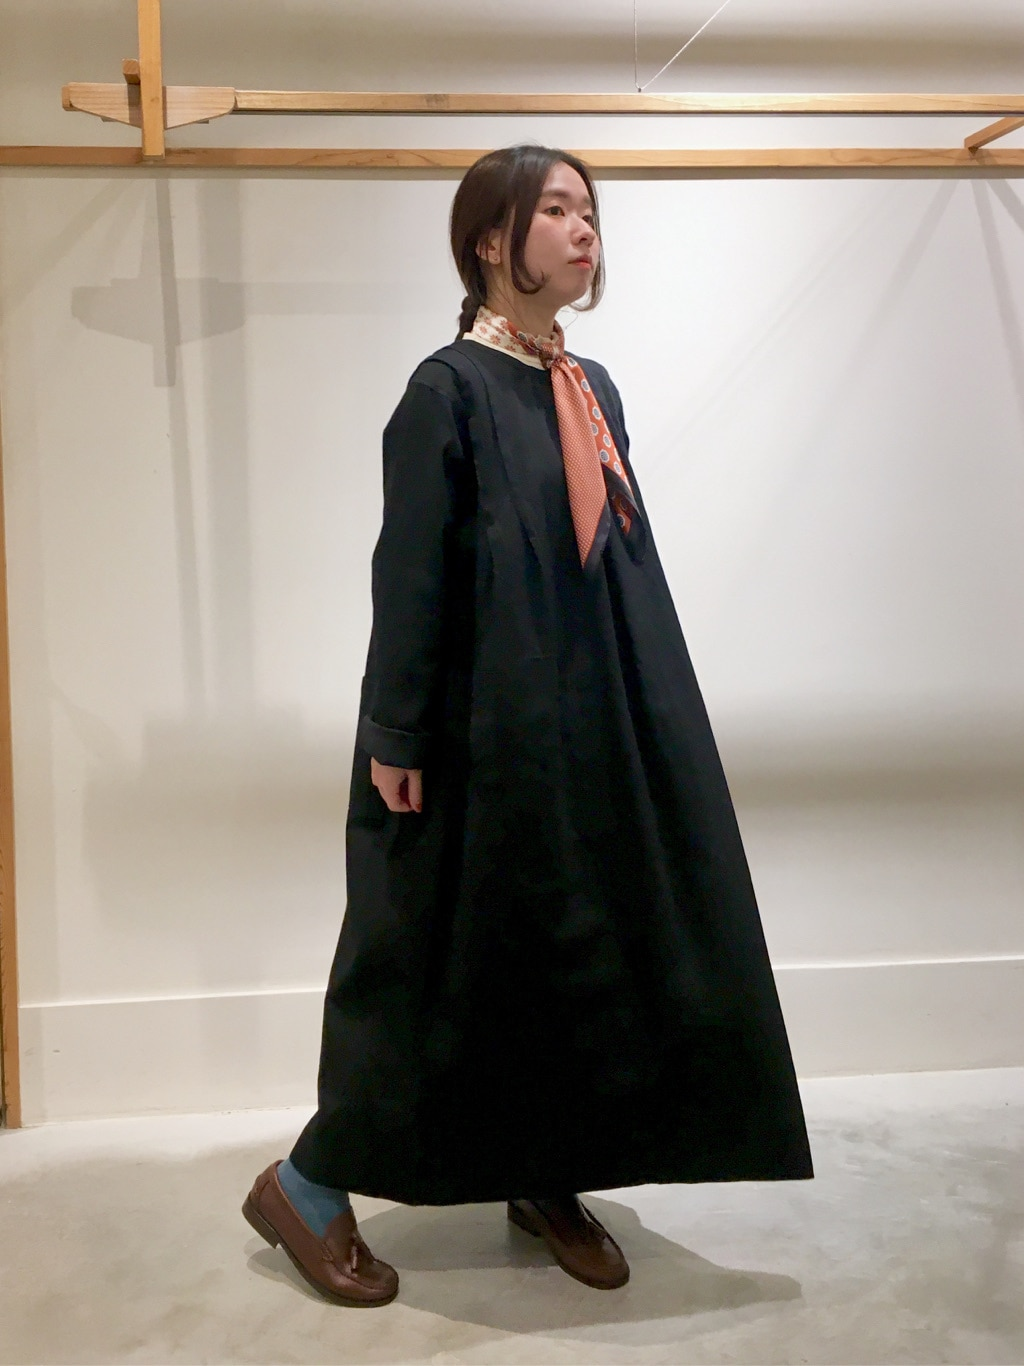 Malle chambre de charme 調布パルコ 身長:152cm 2020.10.22